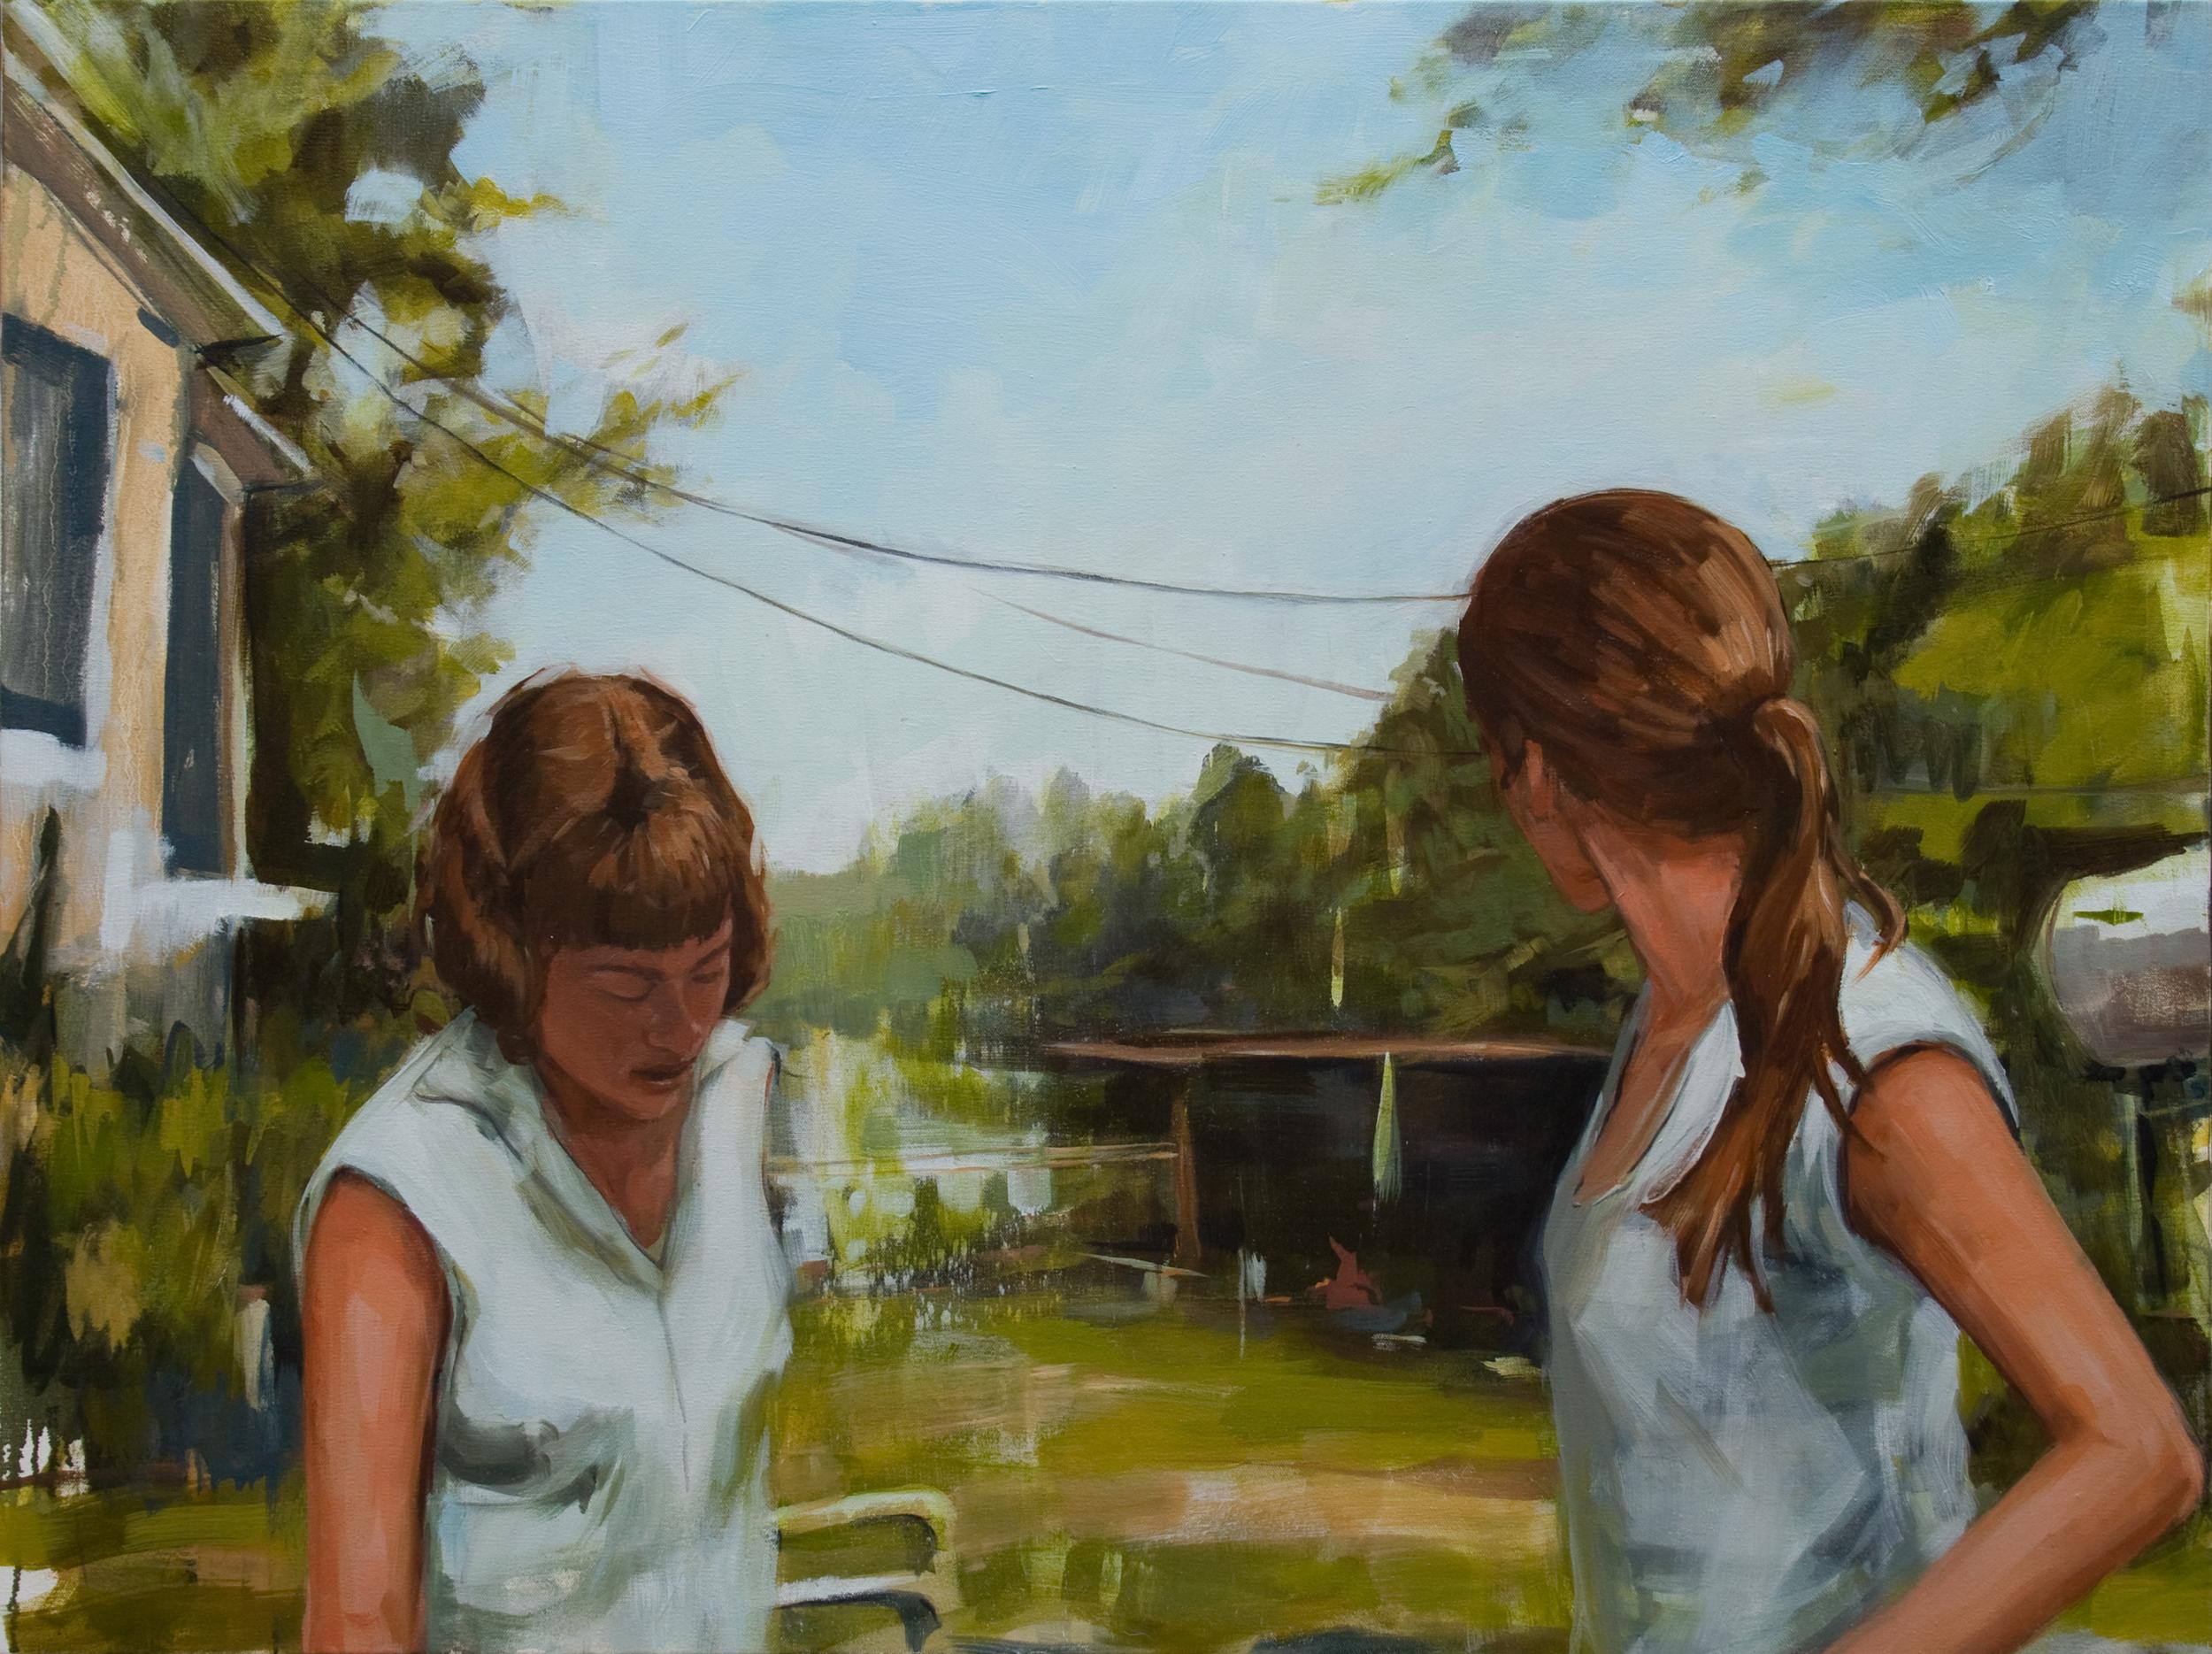 "Sometime in September, oil on canvas, 30"" x 40"", 2013"